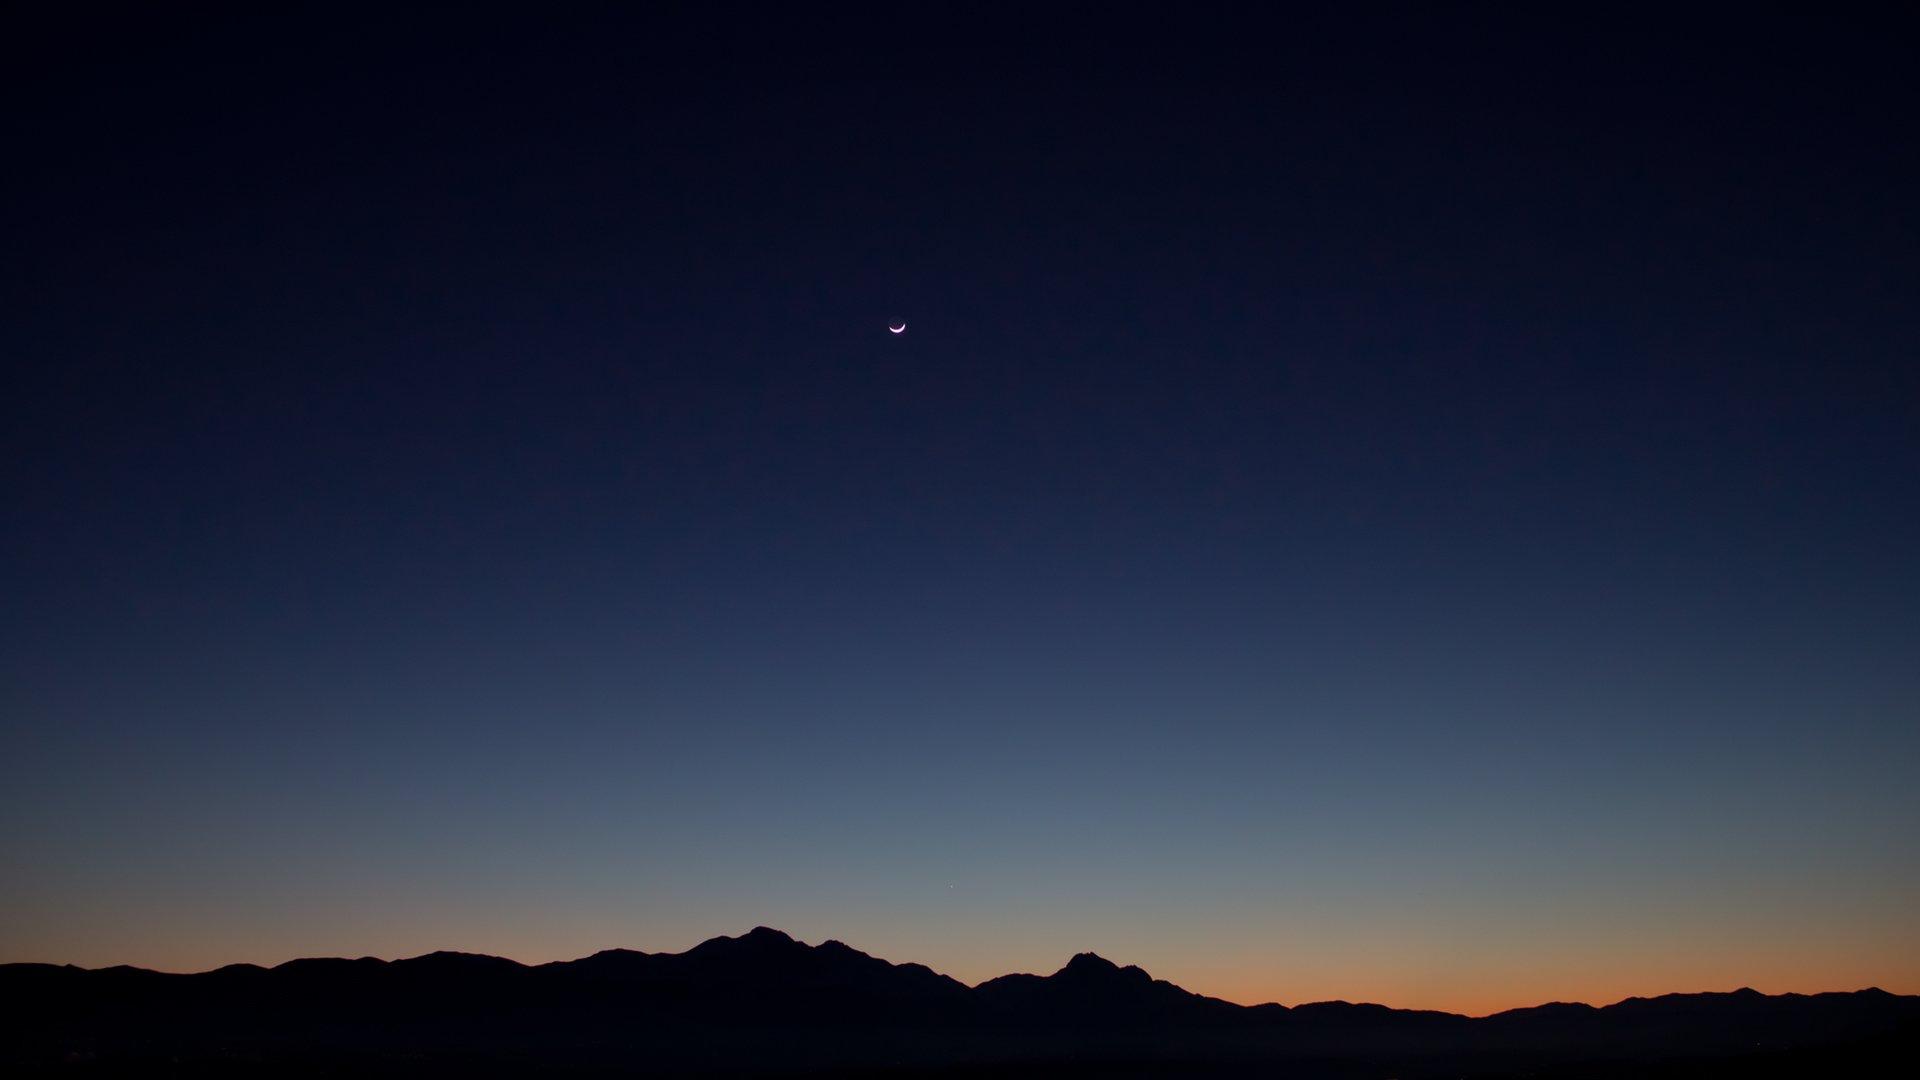 Clear Night Sky Hd Wallpaper